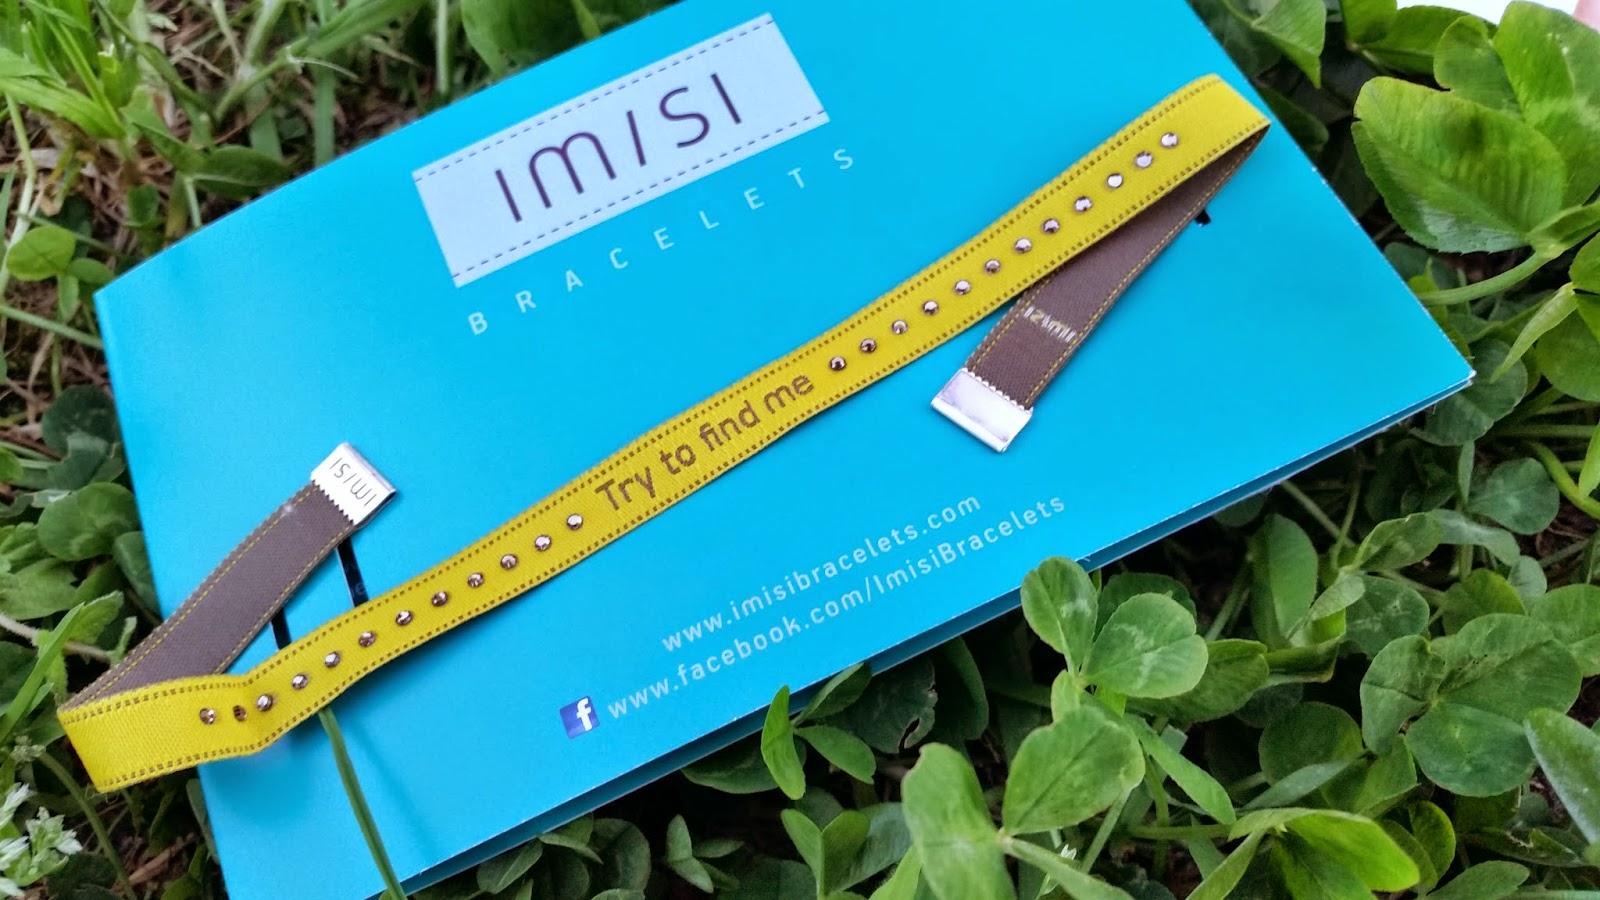 http://www.passaparolablog.com/2015/04/imisi-bracelets-storia-destino-e.html